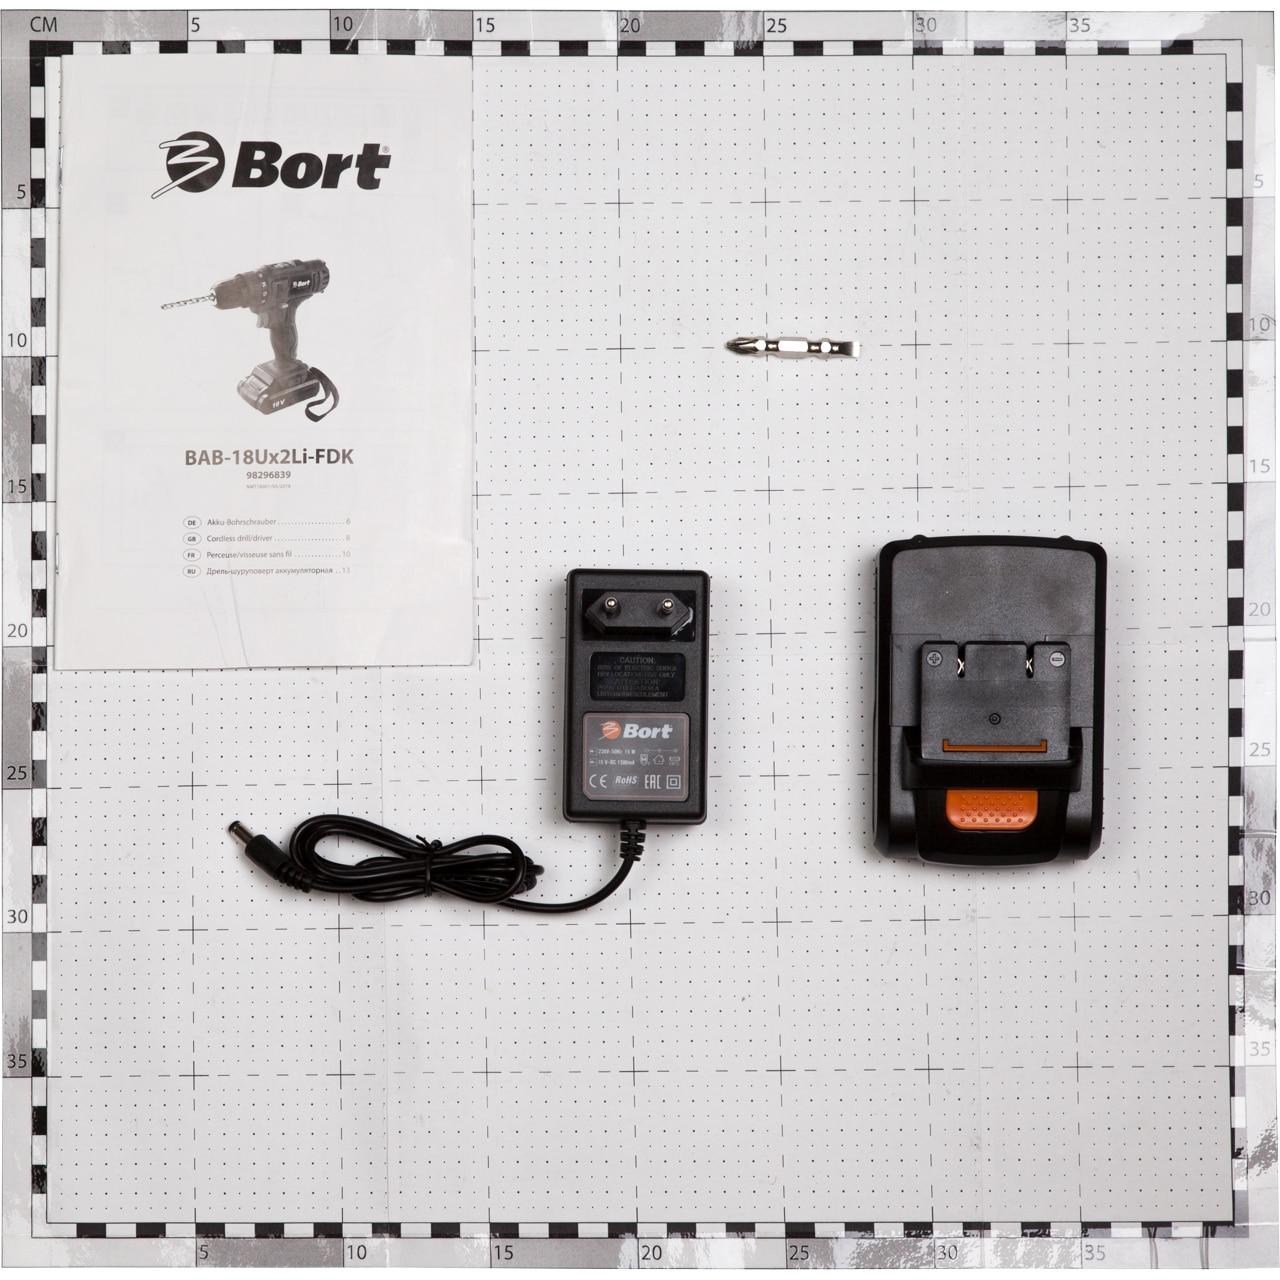 Дрель-шуруповерт аккумуляторная Bort BAB-18Ux2Li-FDK (напряжение 18 В, 2 скорости, 2 аккумулятора, Li-Ion батарея, сумка)